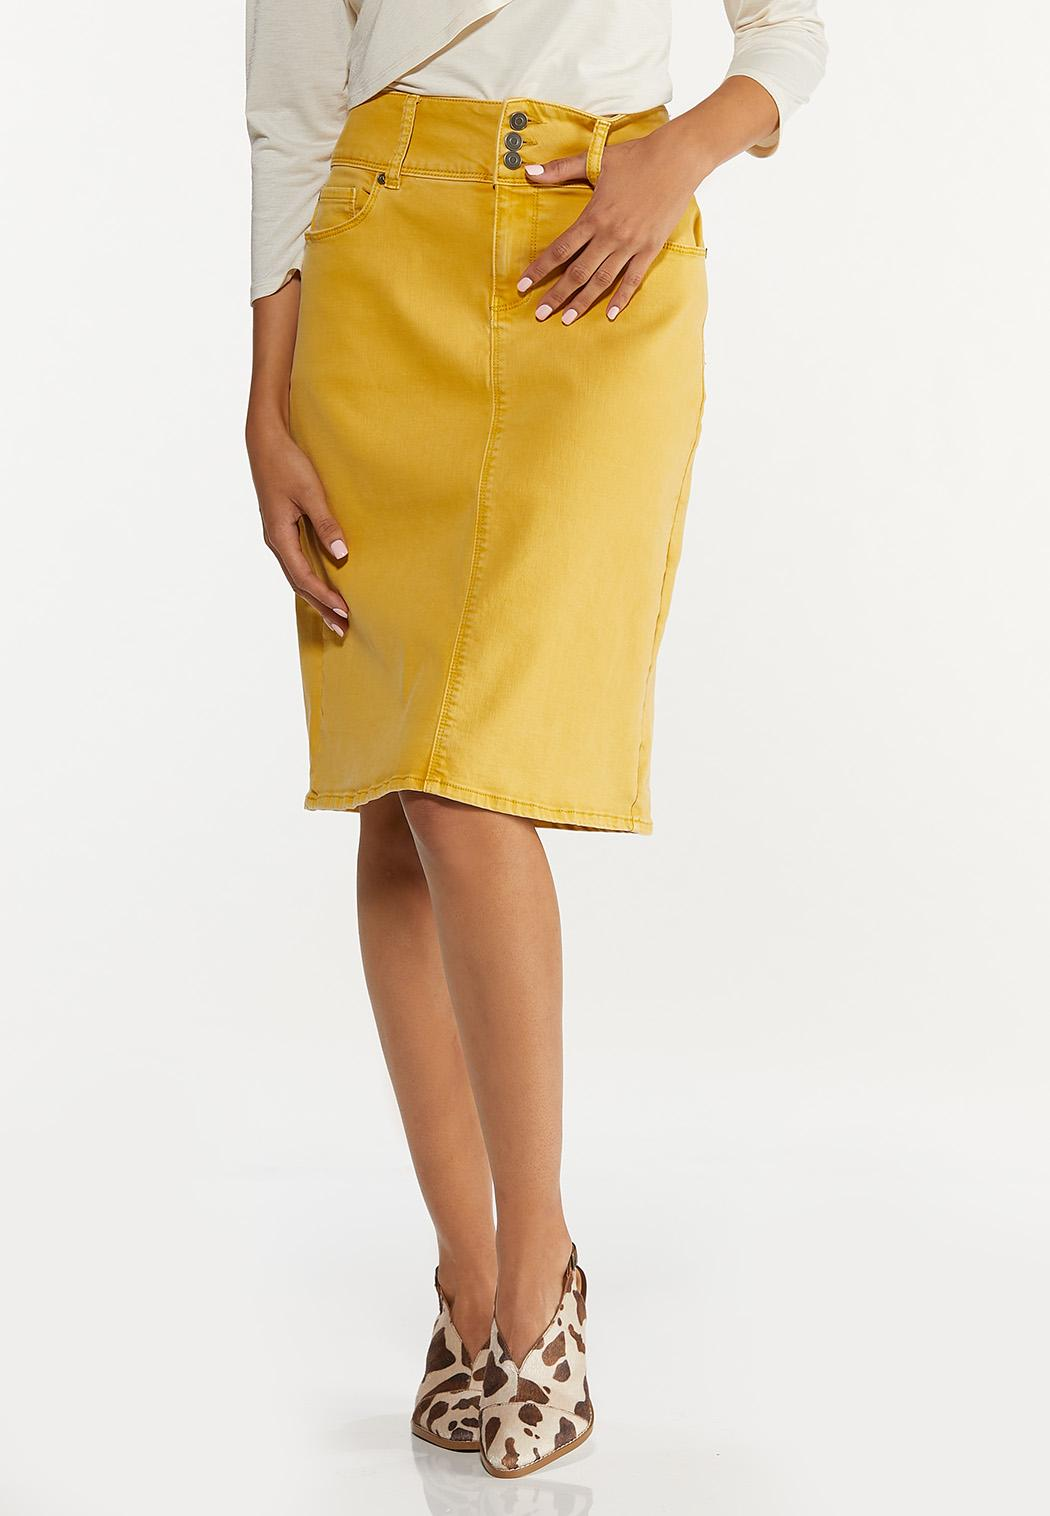 Plus Size Gold Denim Skirt